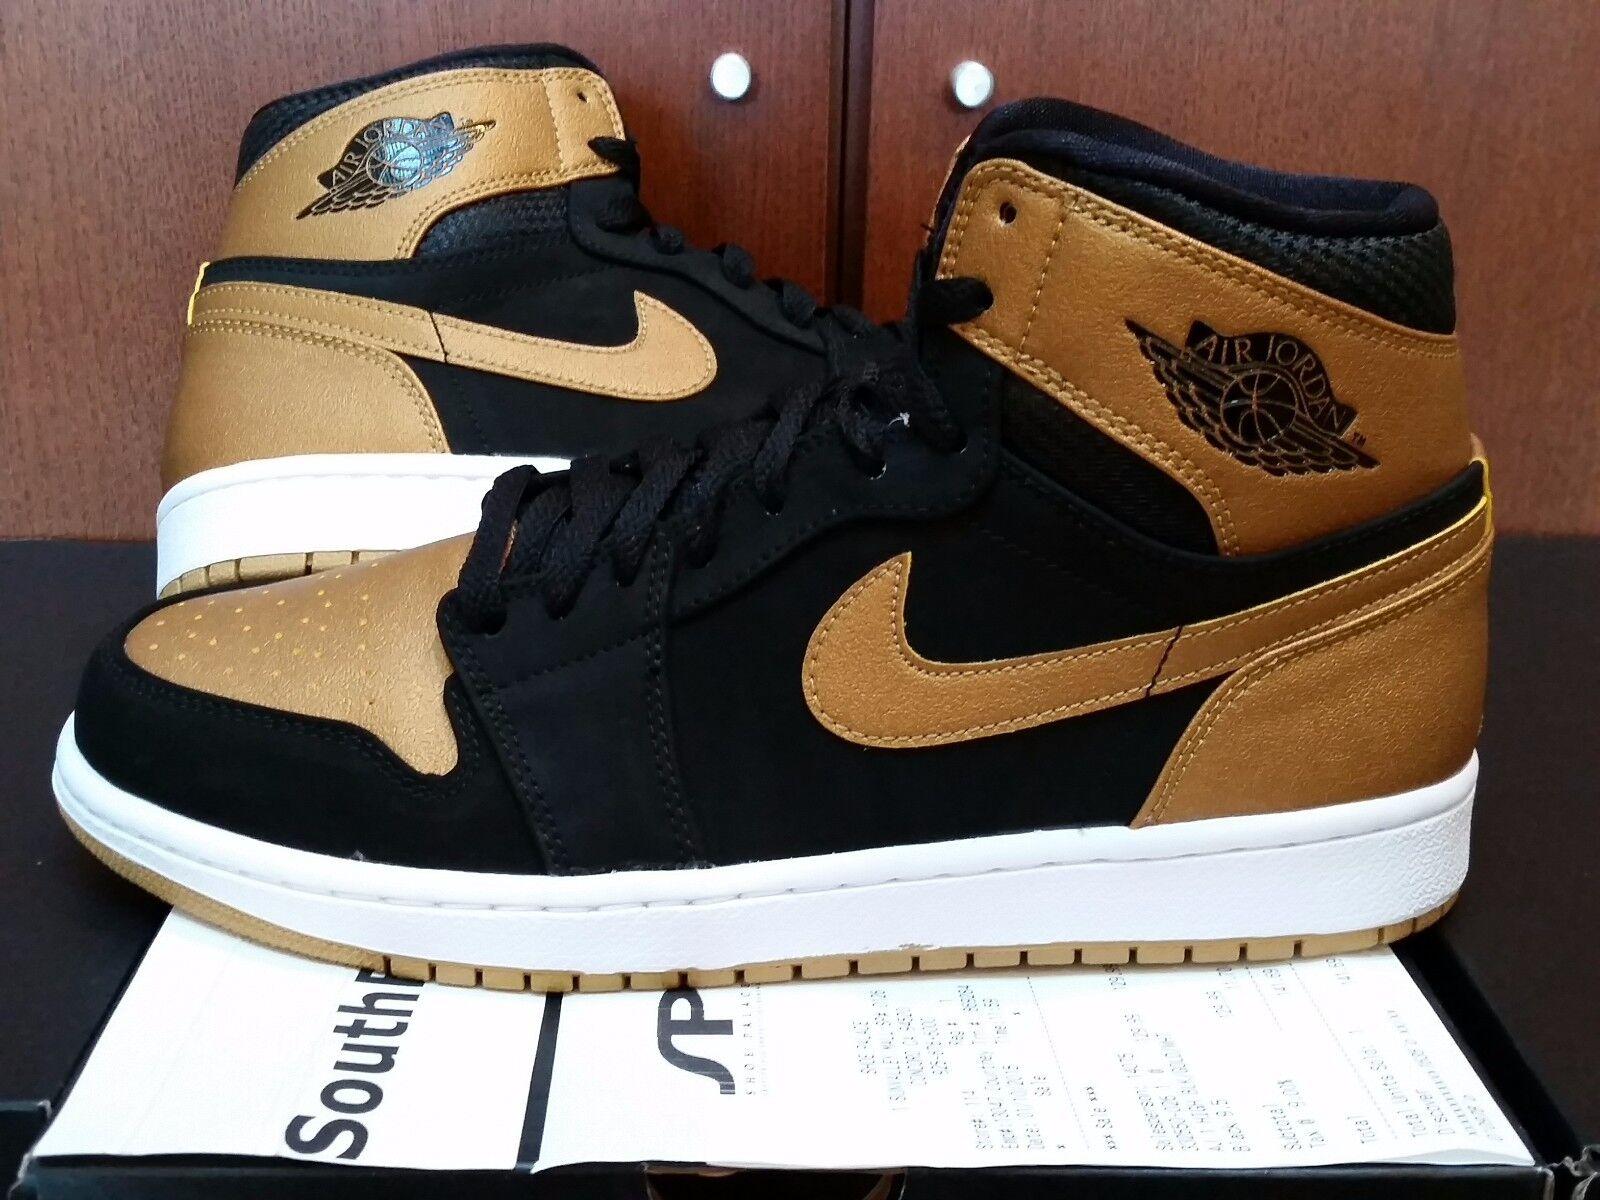 Air Jordan 1 Melo With Receipt I Retro Black Gold Carmelo Anthony 332550-026 DS